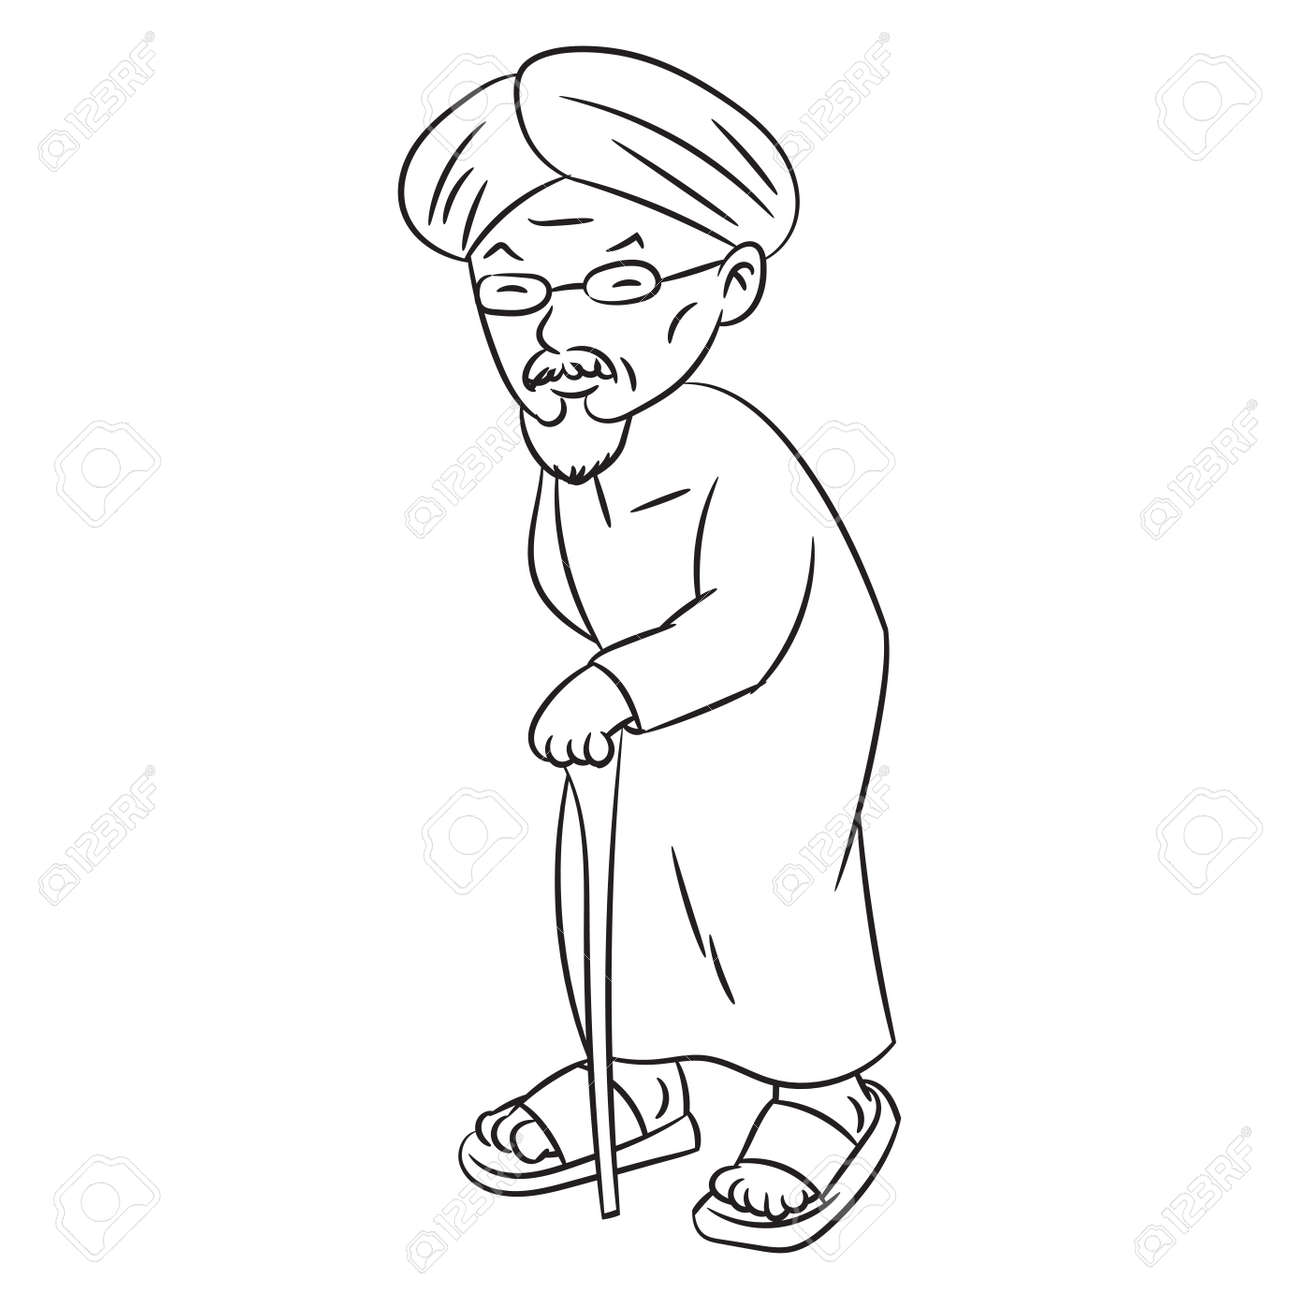 Dibujado A Mano Dibujo De Malay Grandfather Carácter De Dibujos ...